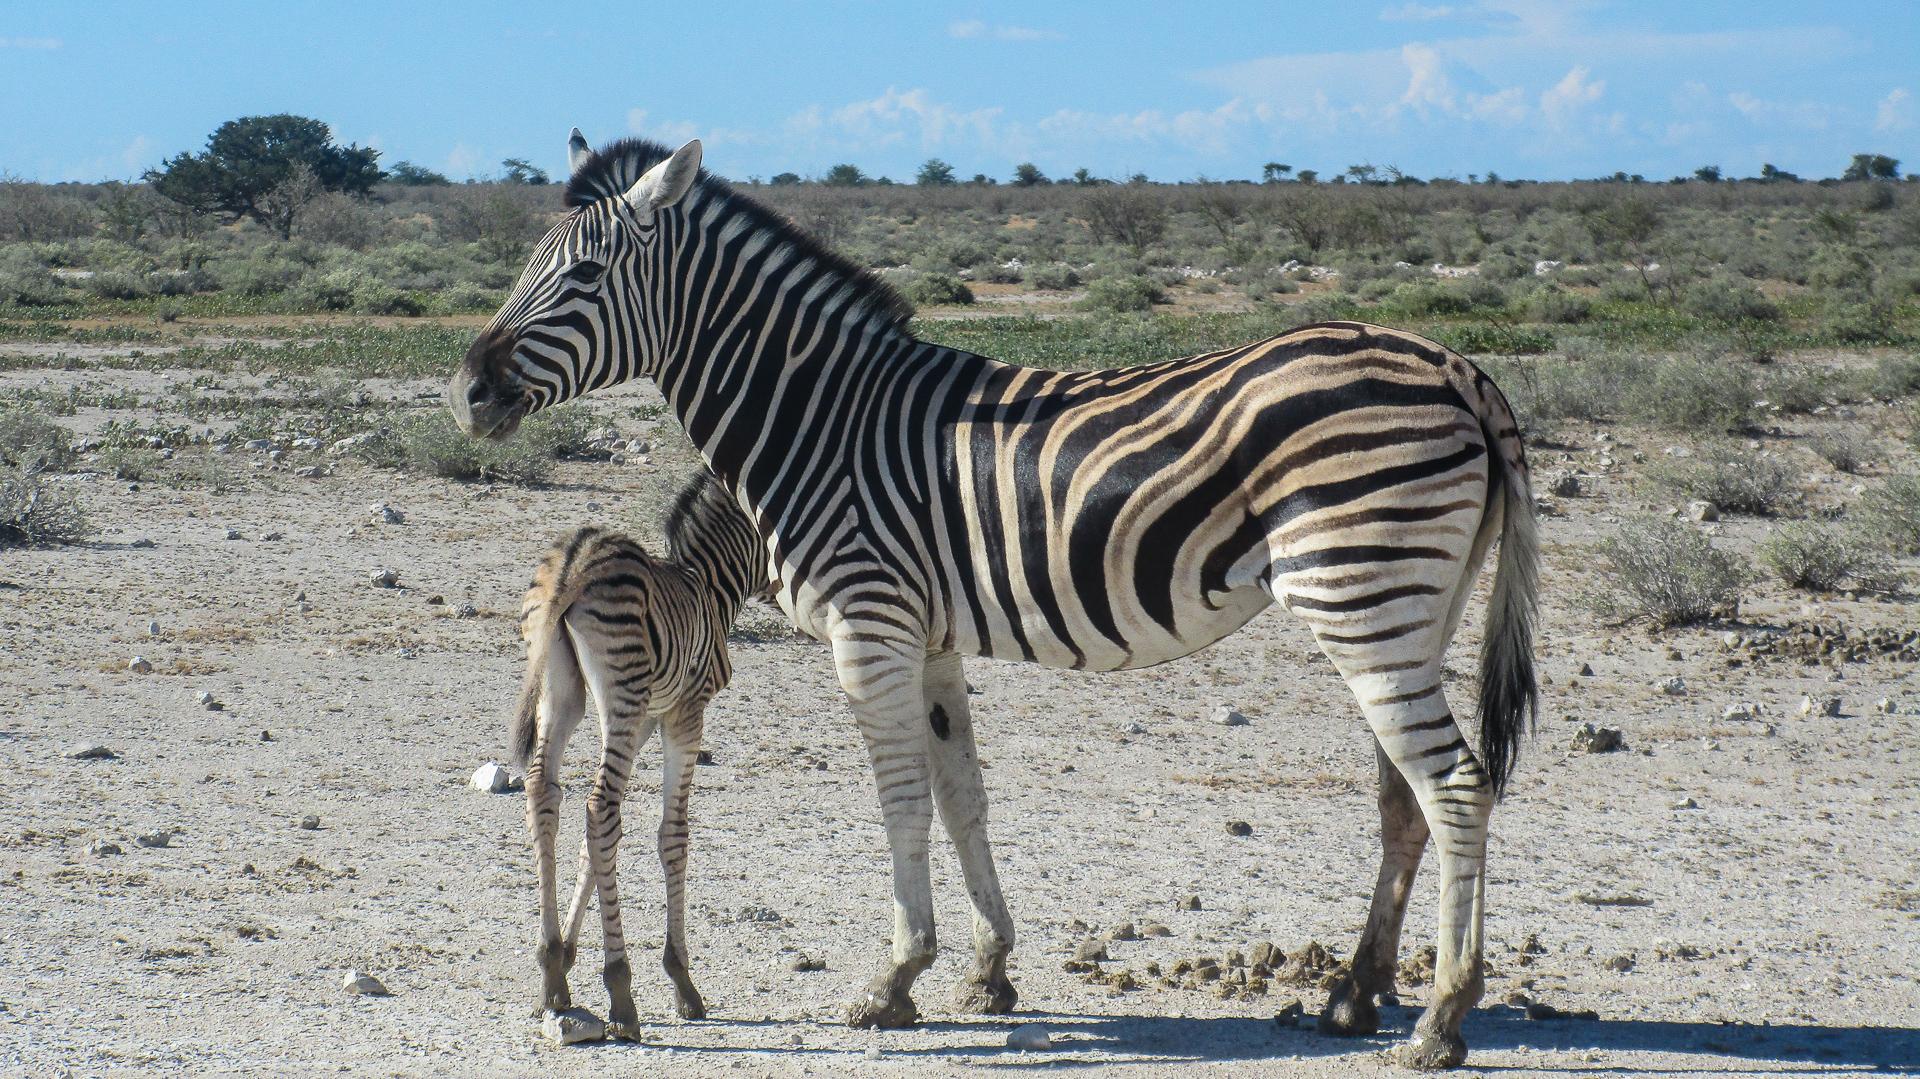 bebe zebre parc d'etosha Namibie